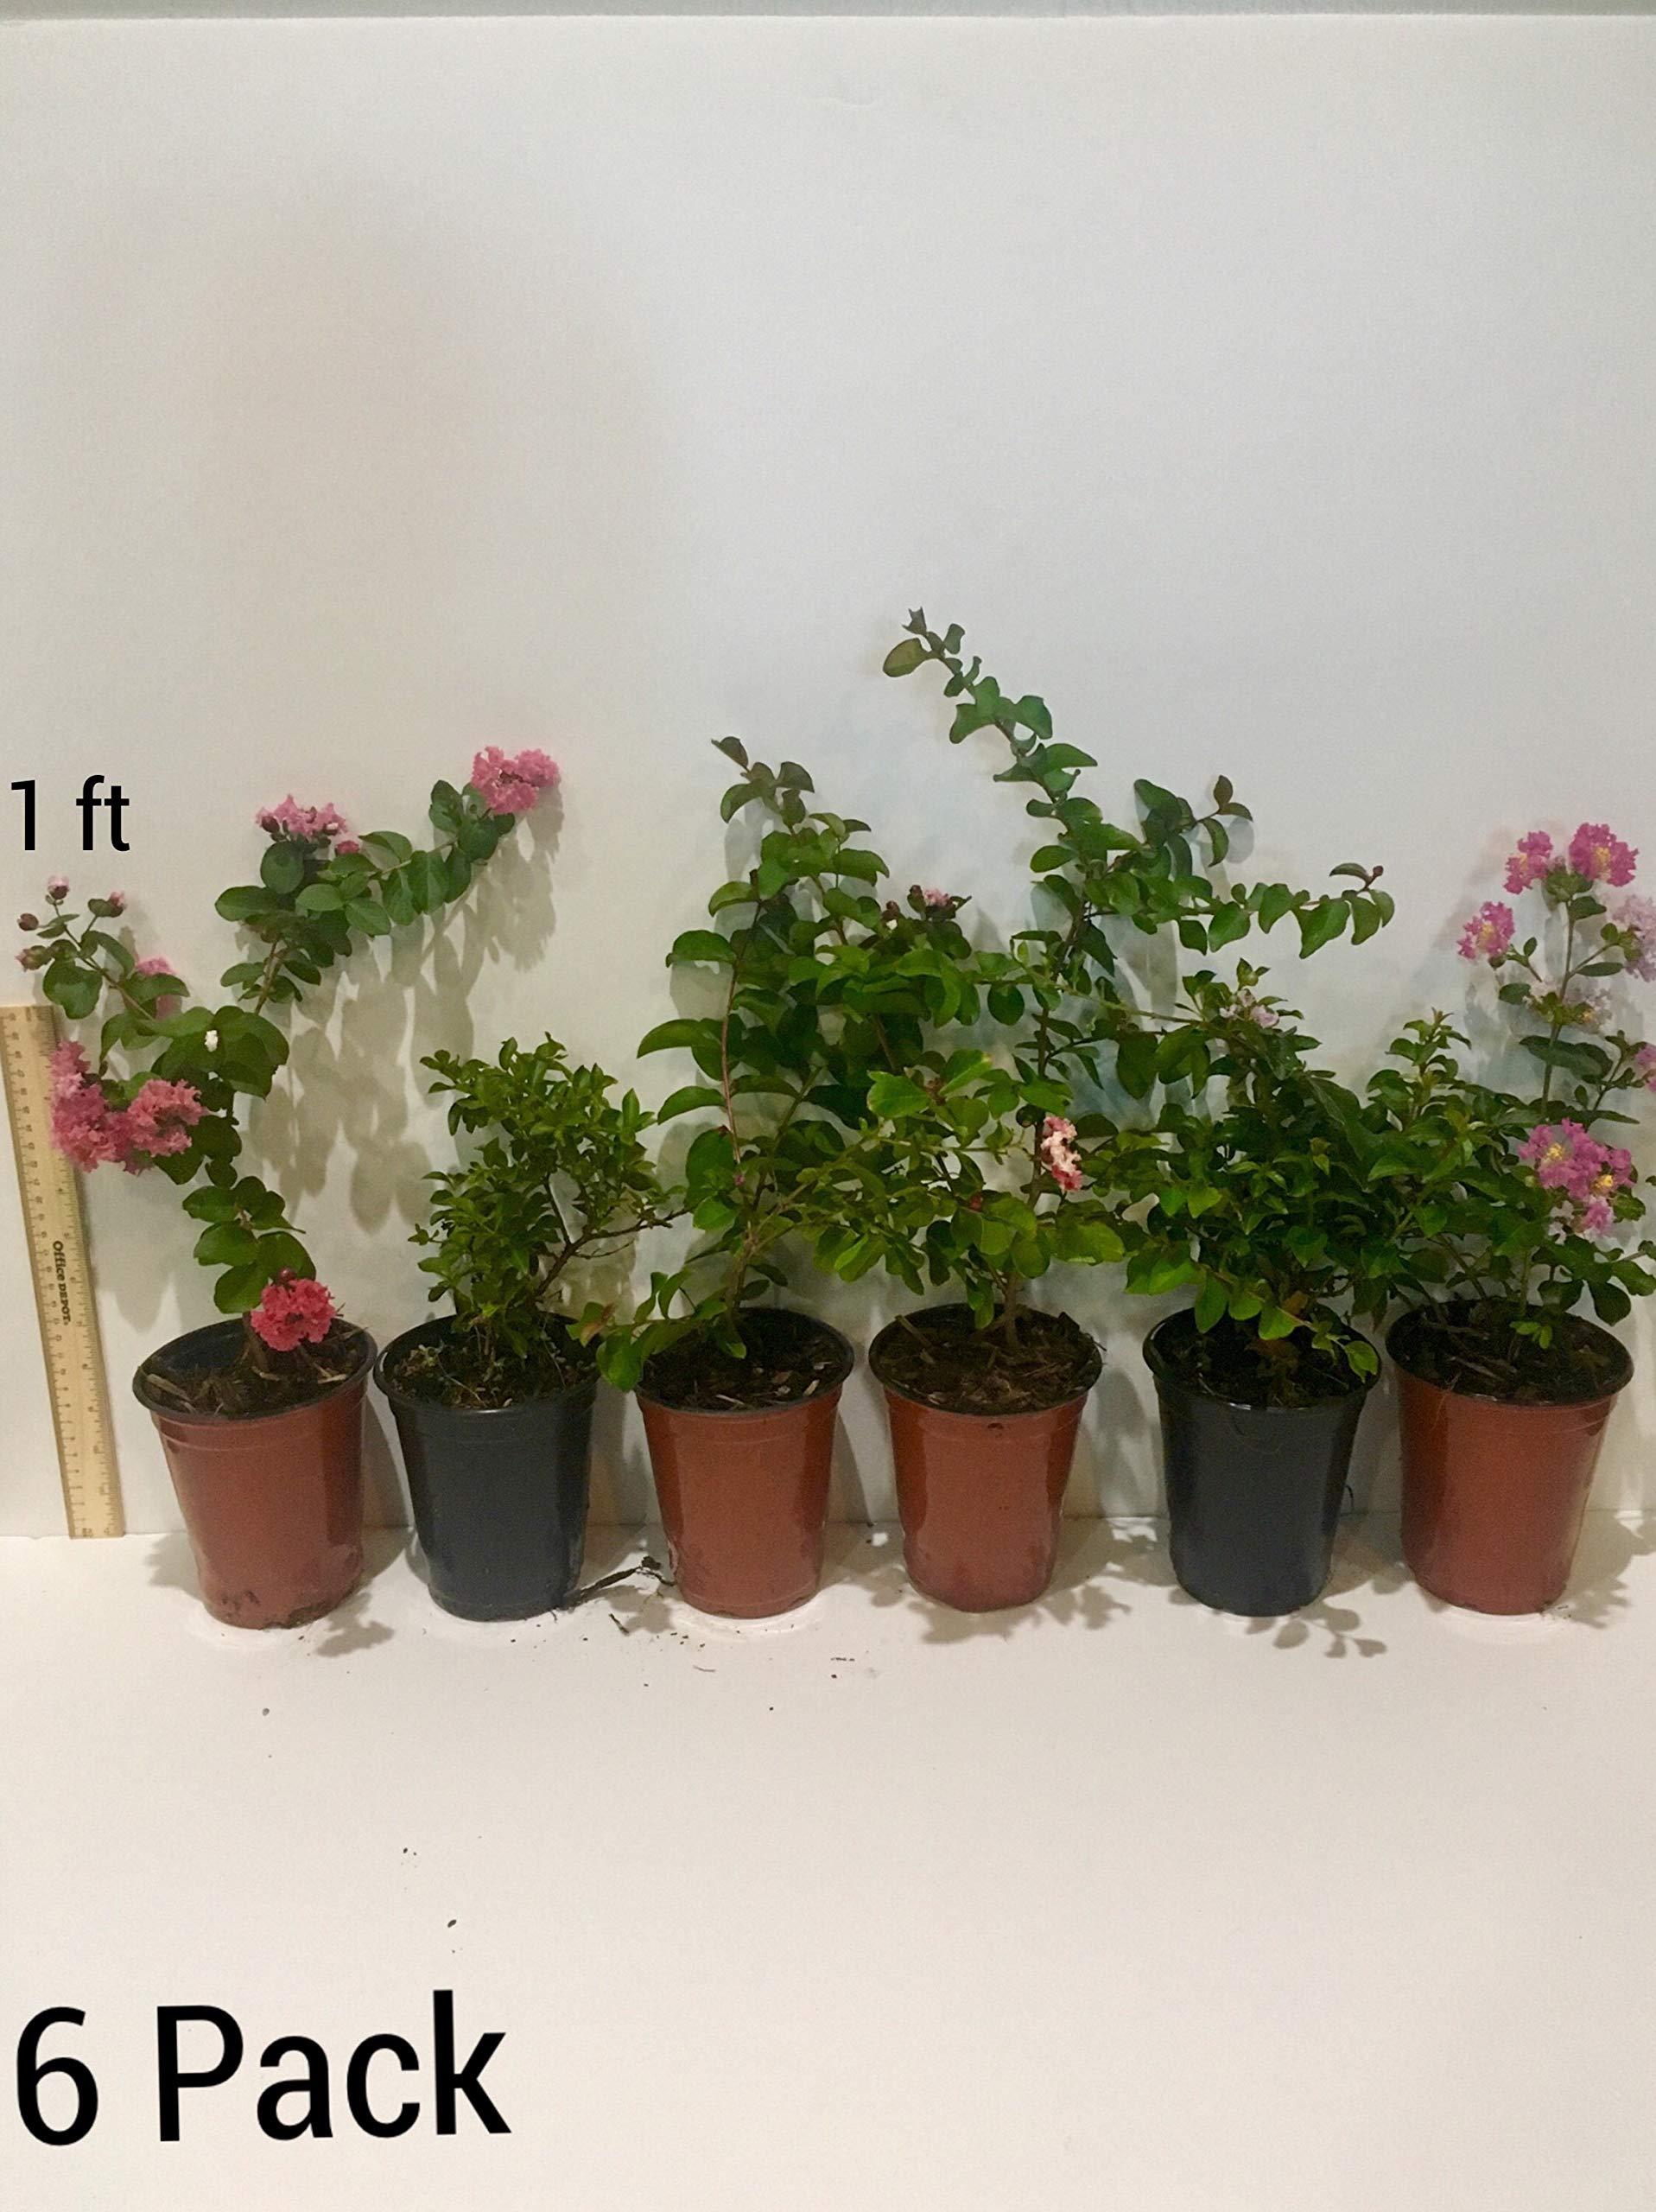 6 Pack - Arapaho - Red Flowering Crape Myrtle Trees - Lagerstroemia by CrapeMyrtleGuy (Image #2)